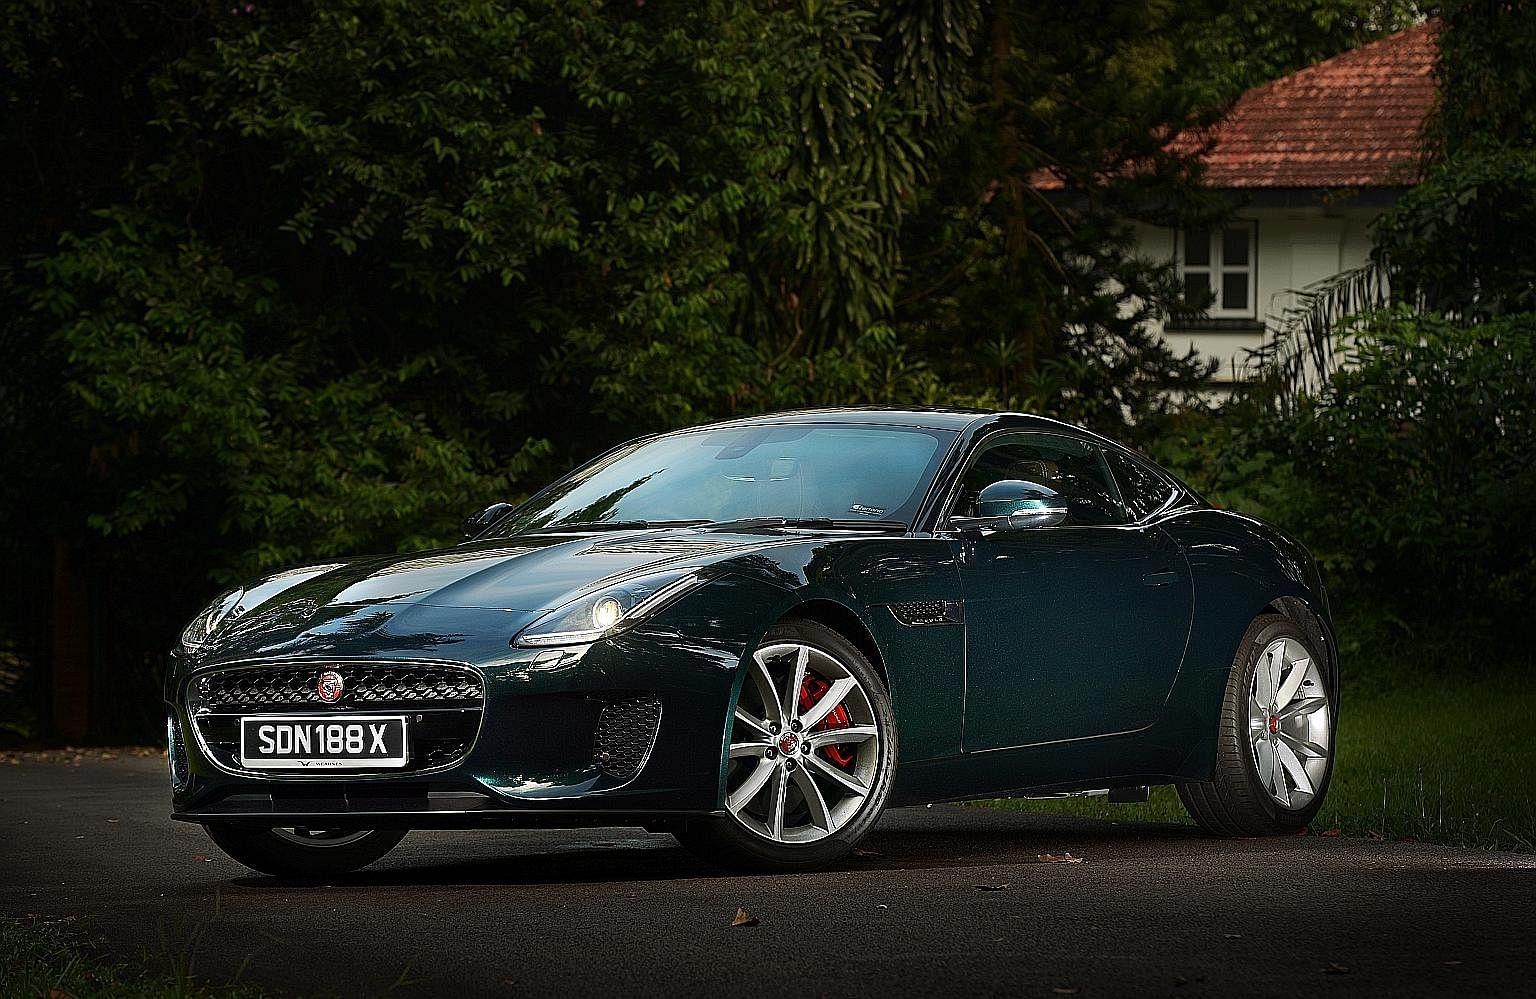 Jaguar F-Type 2.0, Mazda MX-5 and BMW M2.